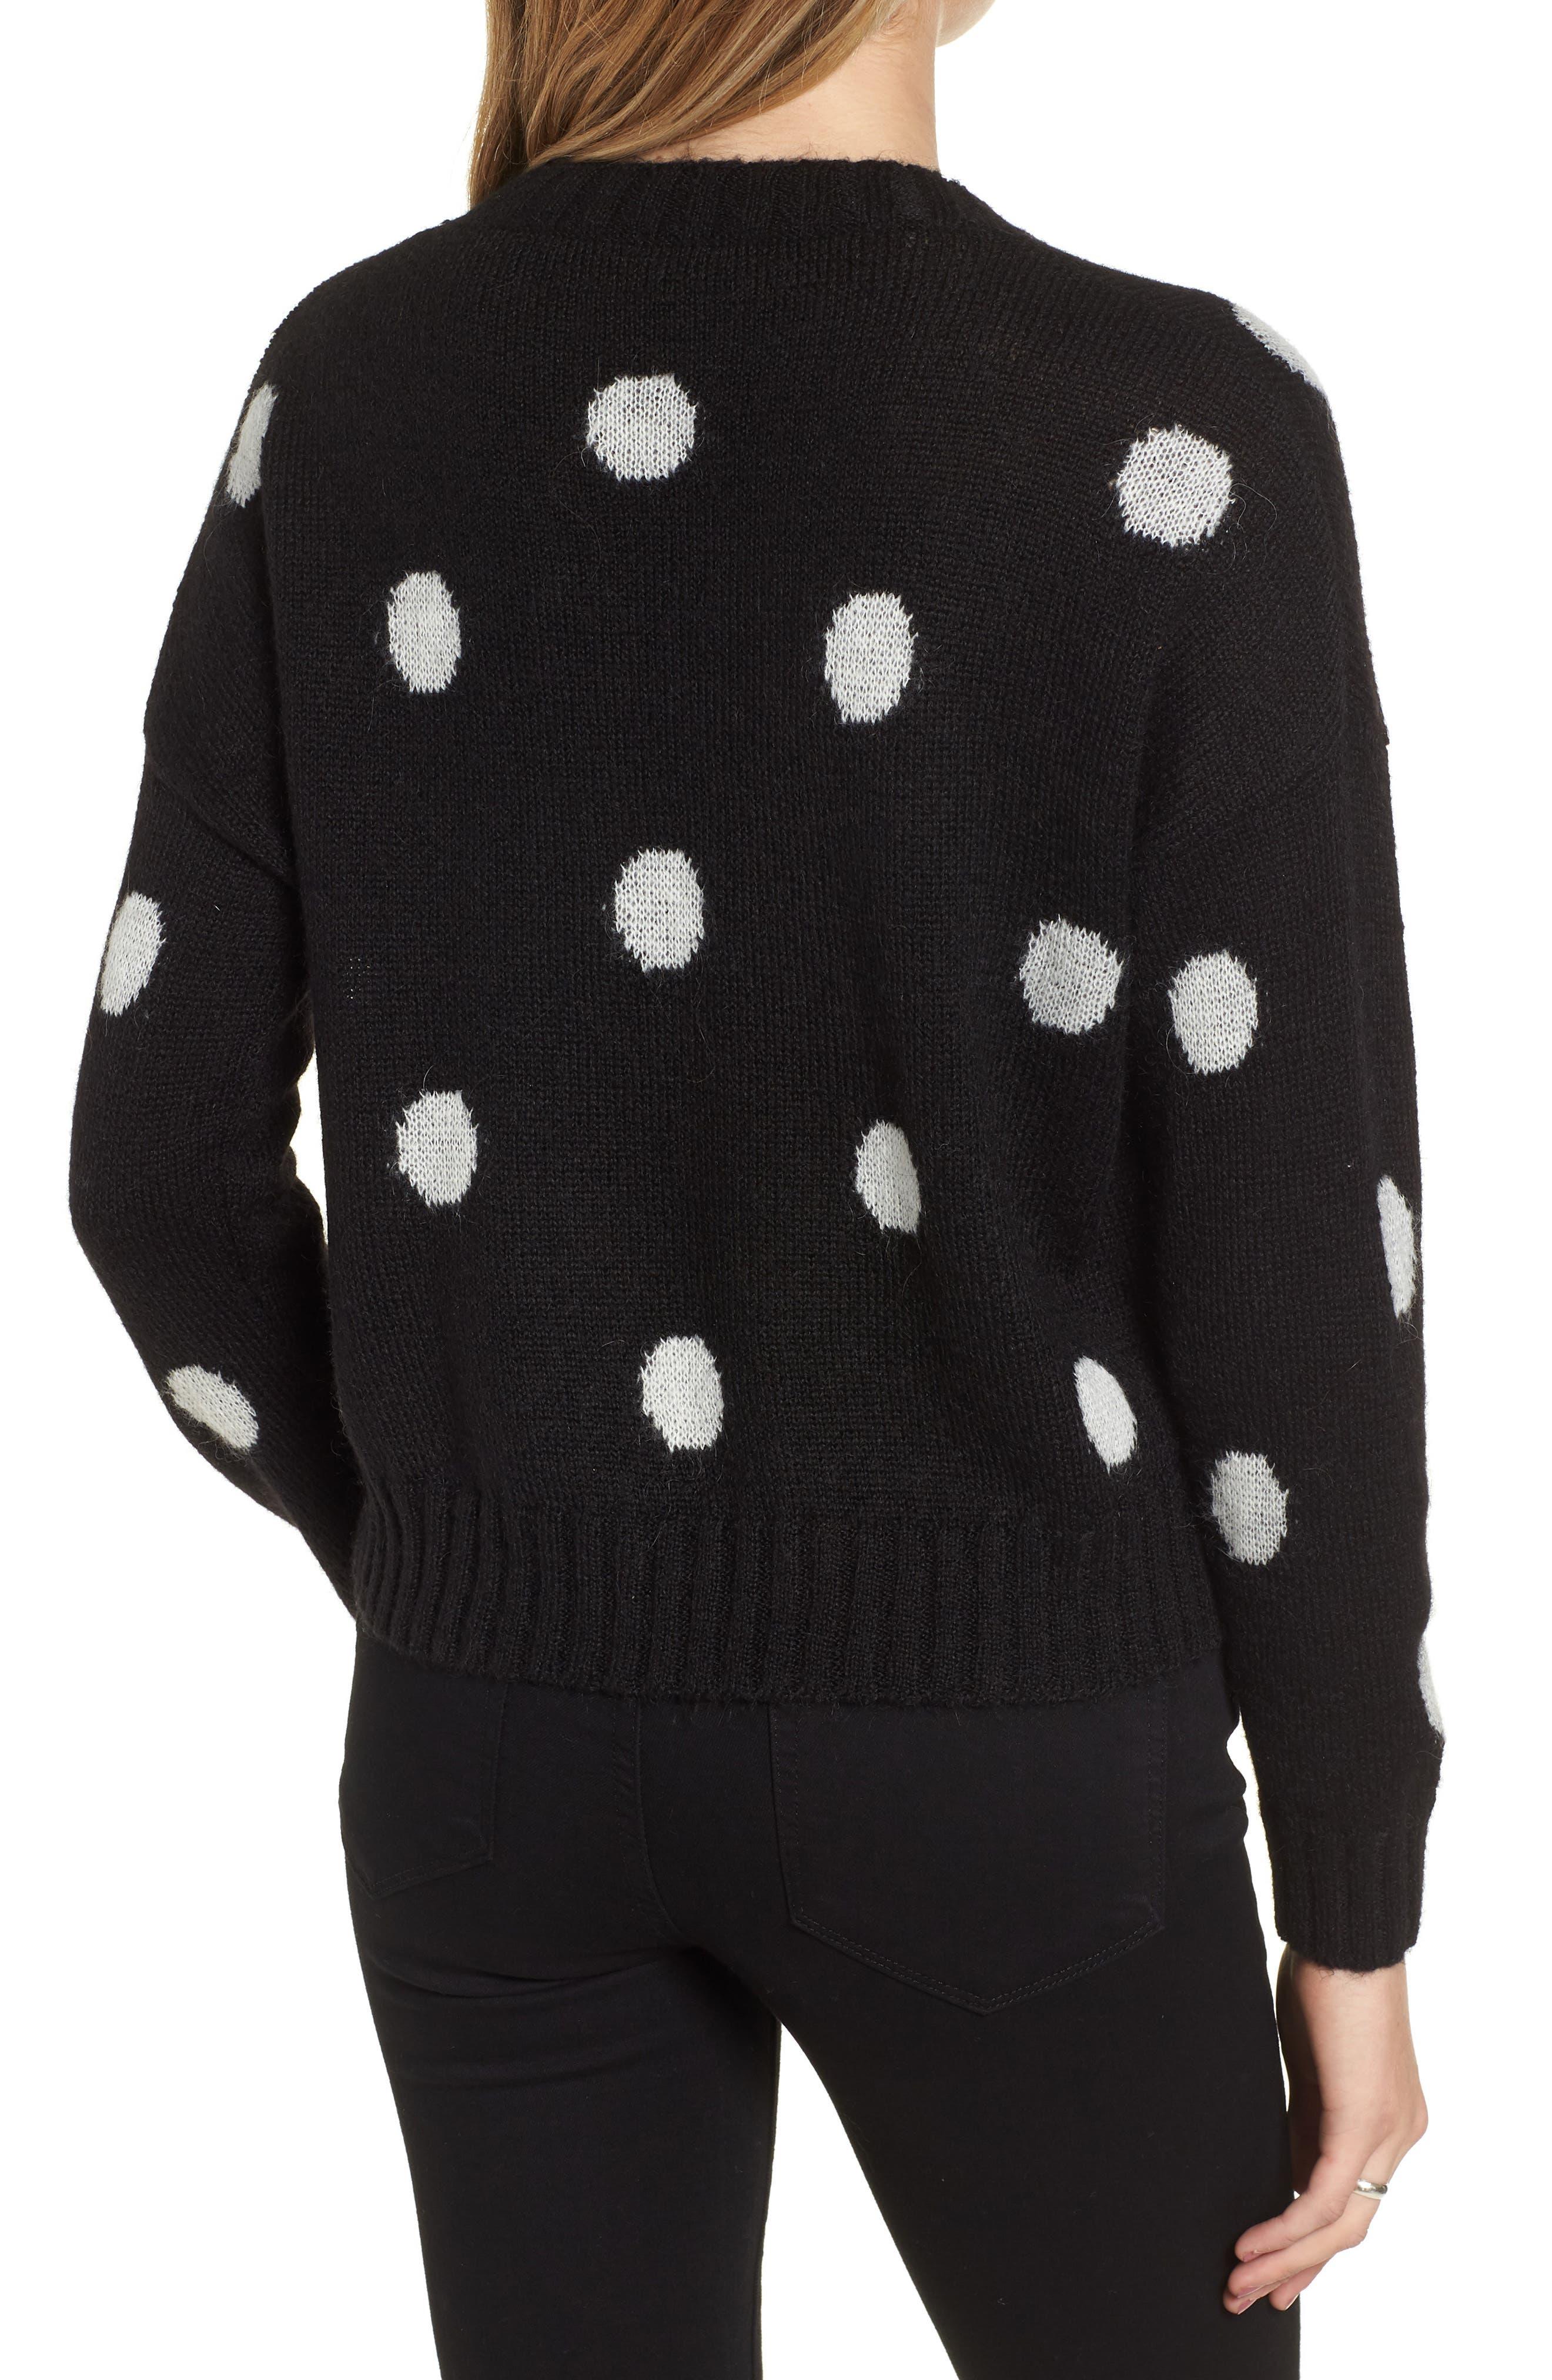 Perci Sweater,                             Alternate thumbnail 2, color,                             BLACK/ IVORY POLKA DOT